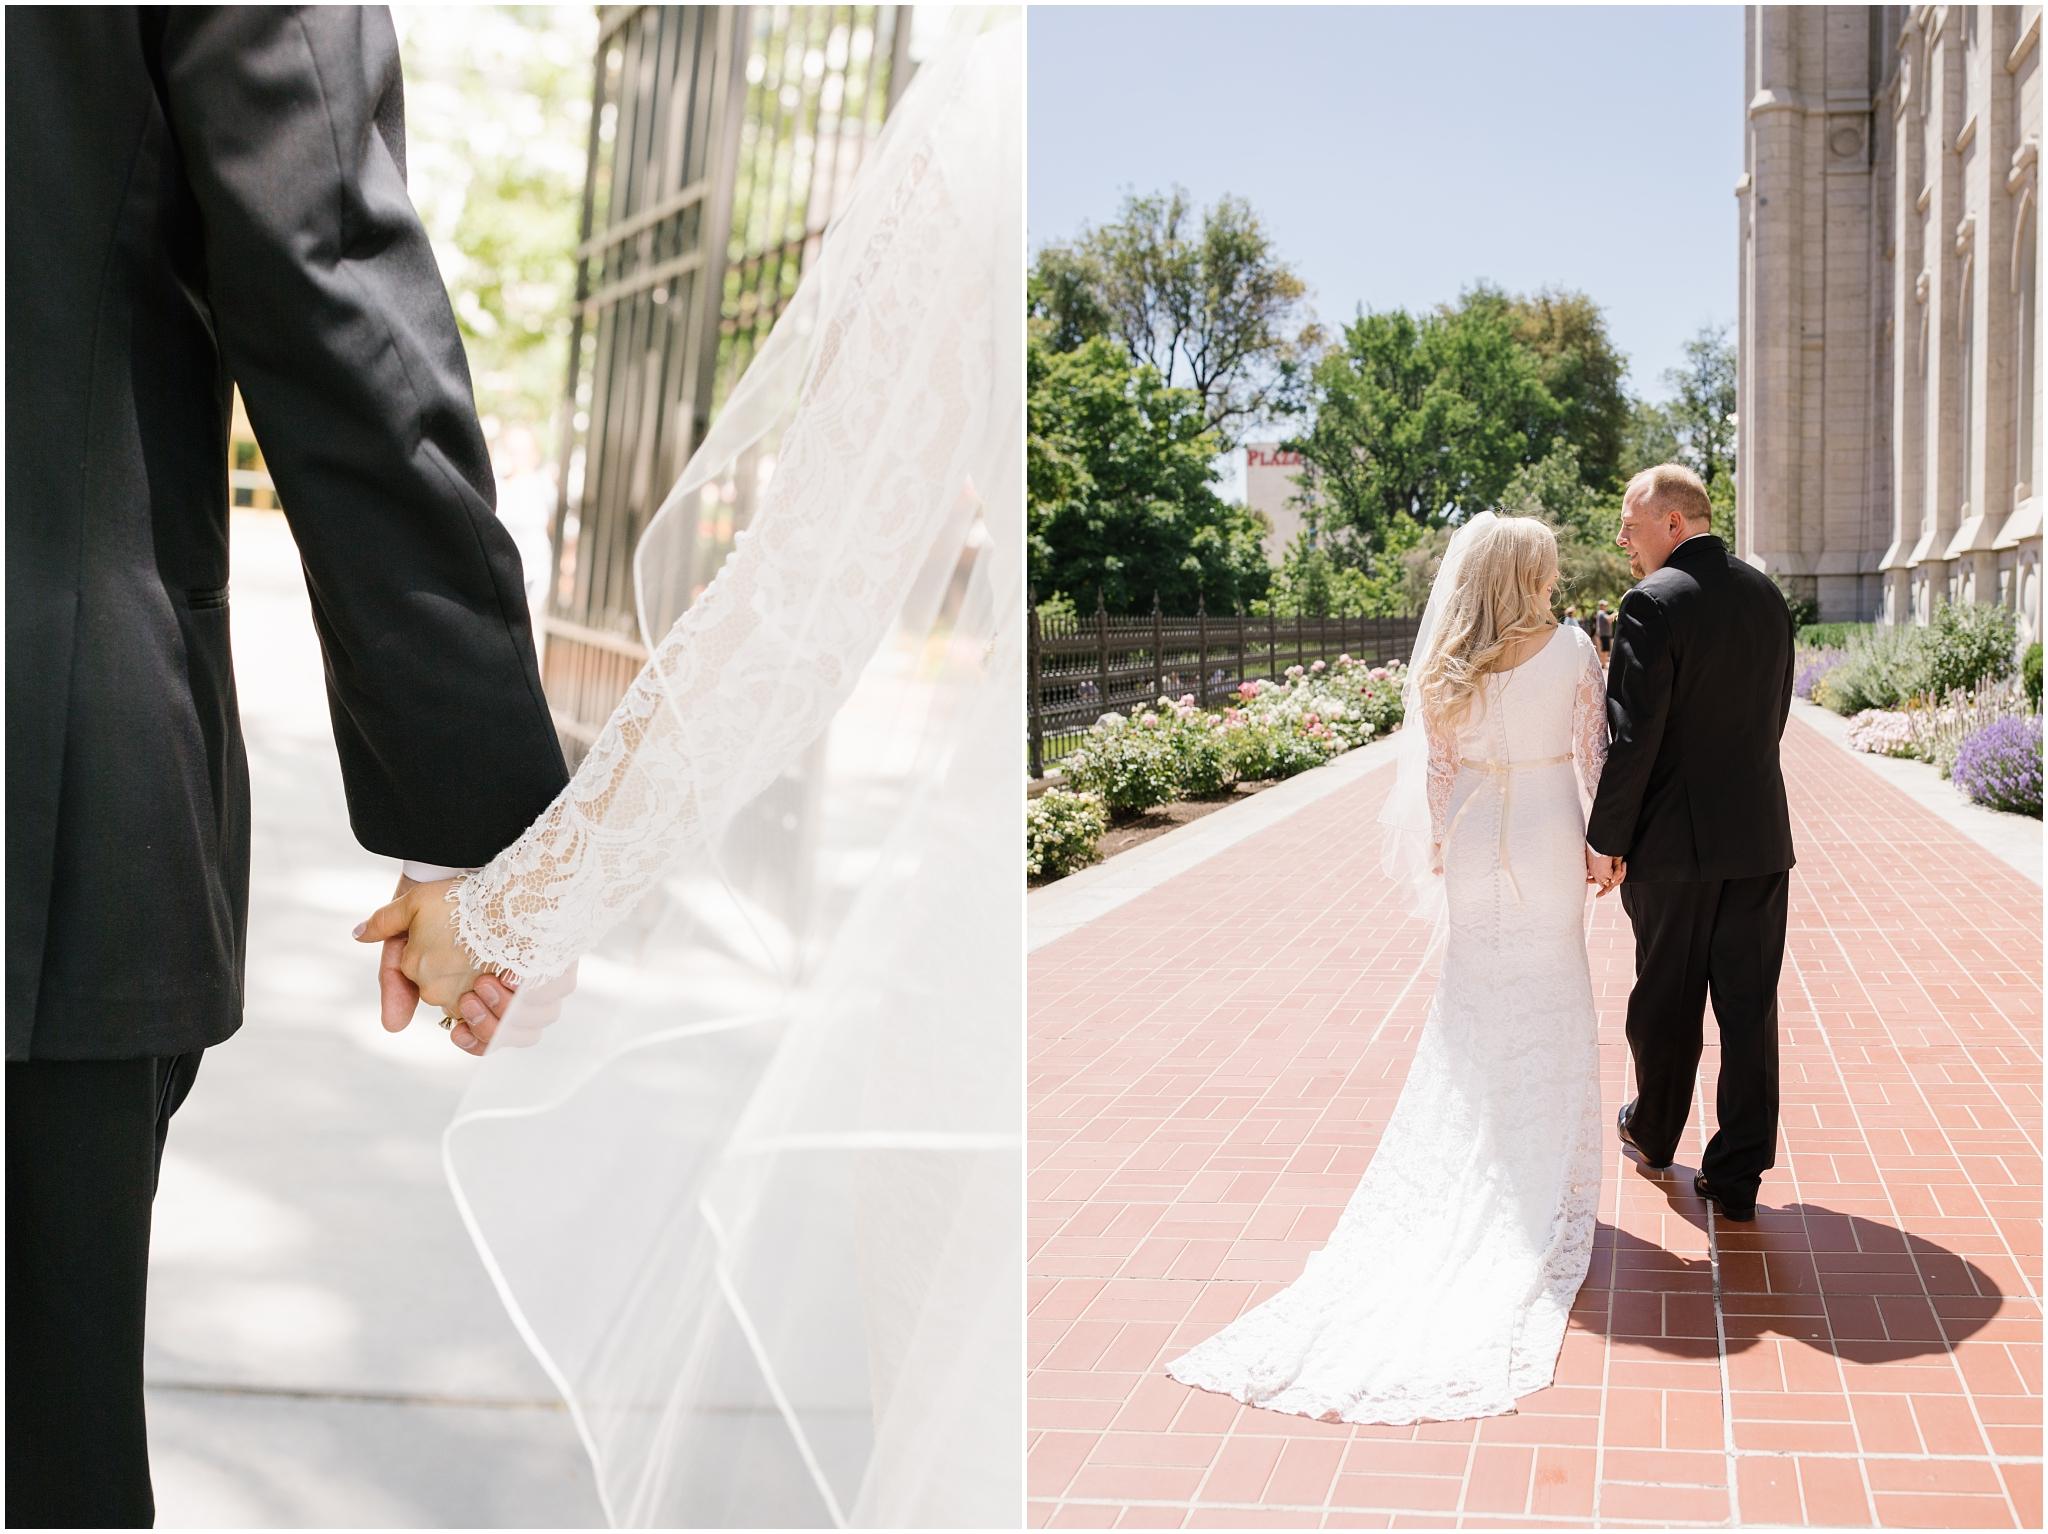 CherylandTyler-217_Lizzie-B-Imagery-Utah-Wedding-Photographer-Salt-Lake-City-Temple-Wells-Fargo-Building-Reception.jpg